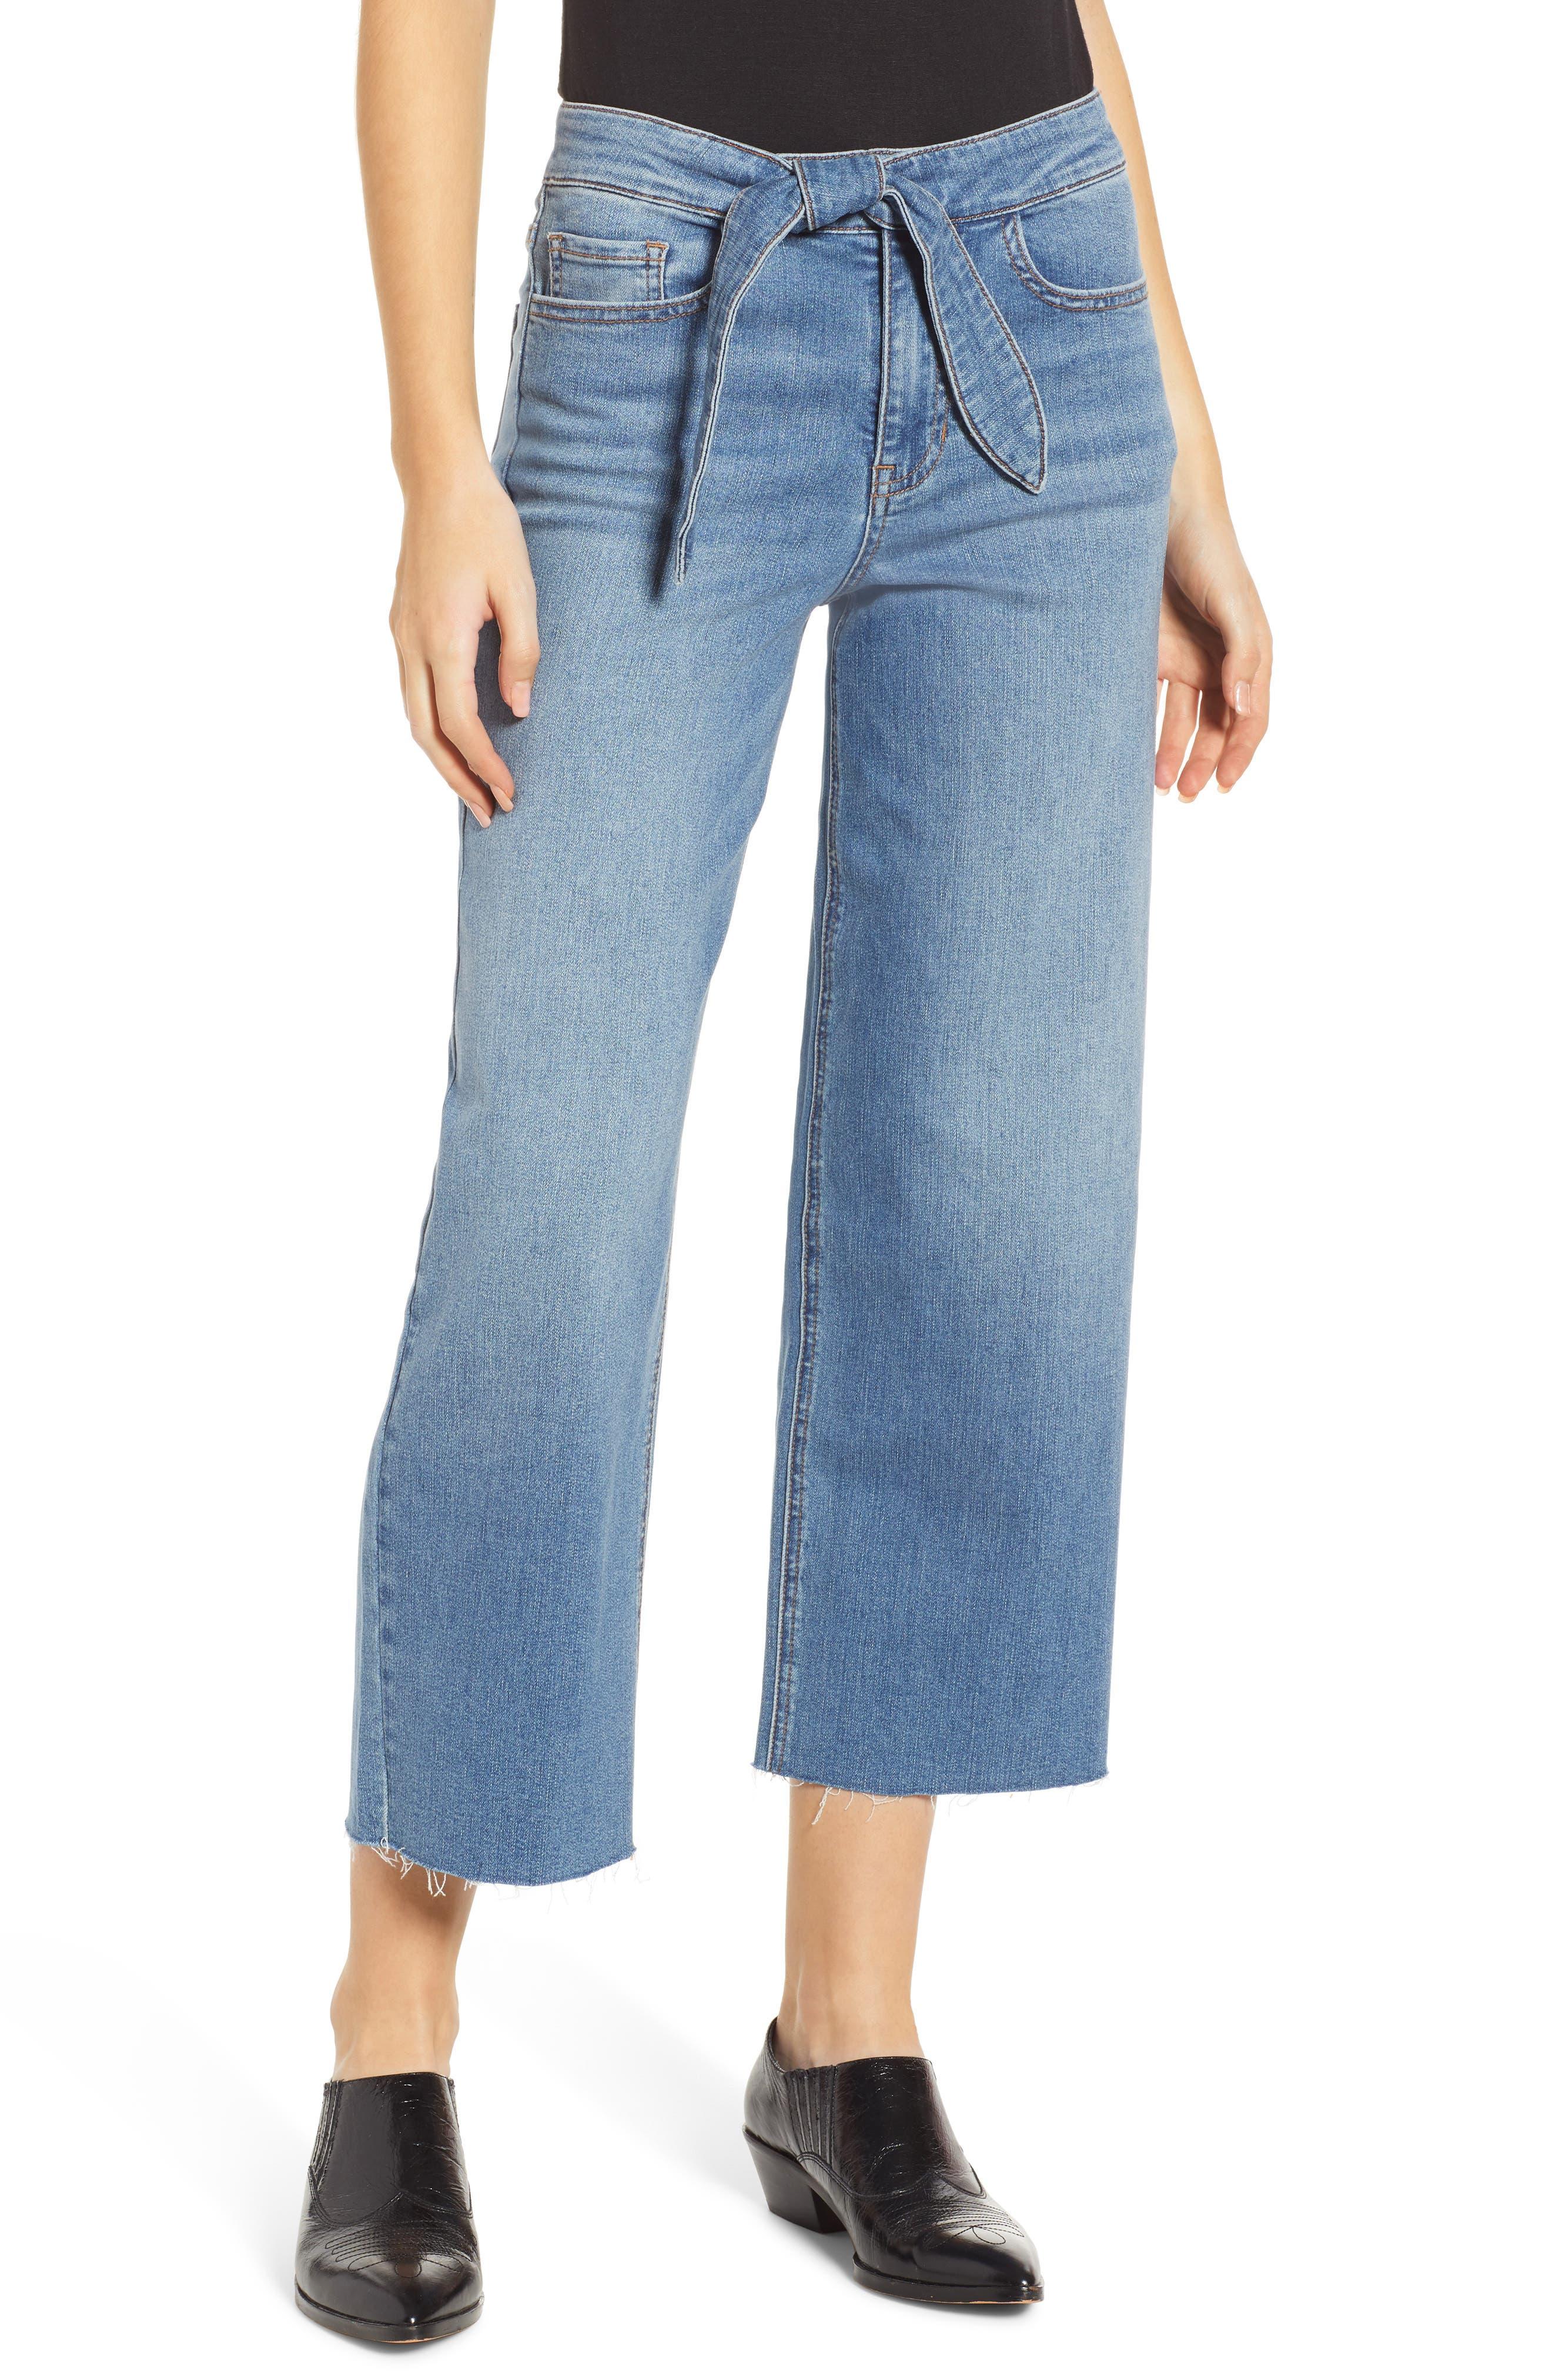 PROSPERITY DENIM Belted Crop Wide Leg Jeans, Main, color, PRETTY WASH